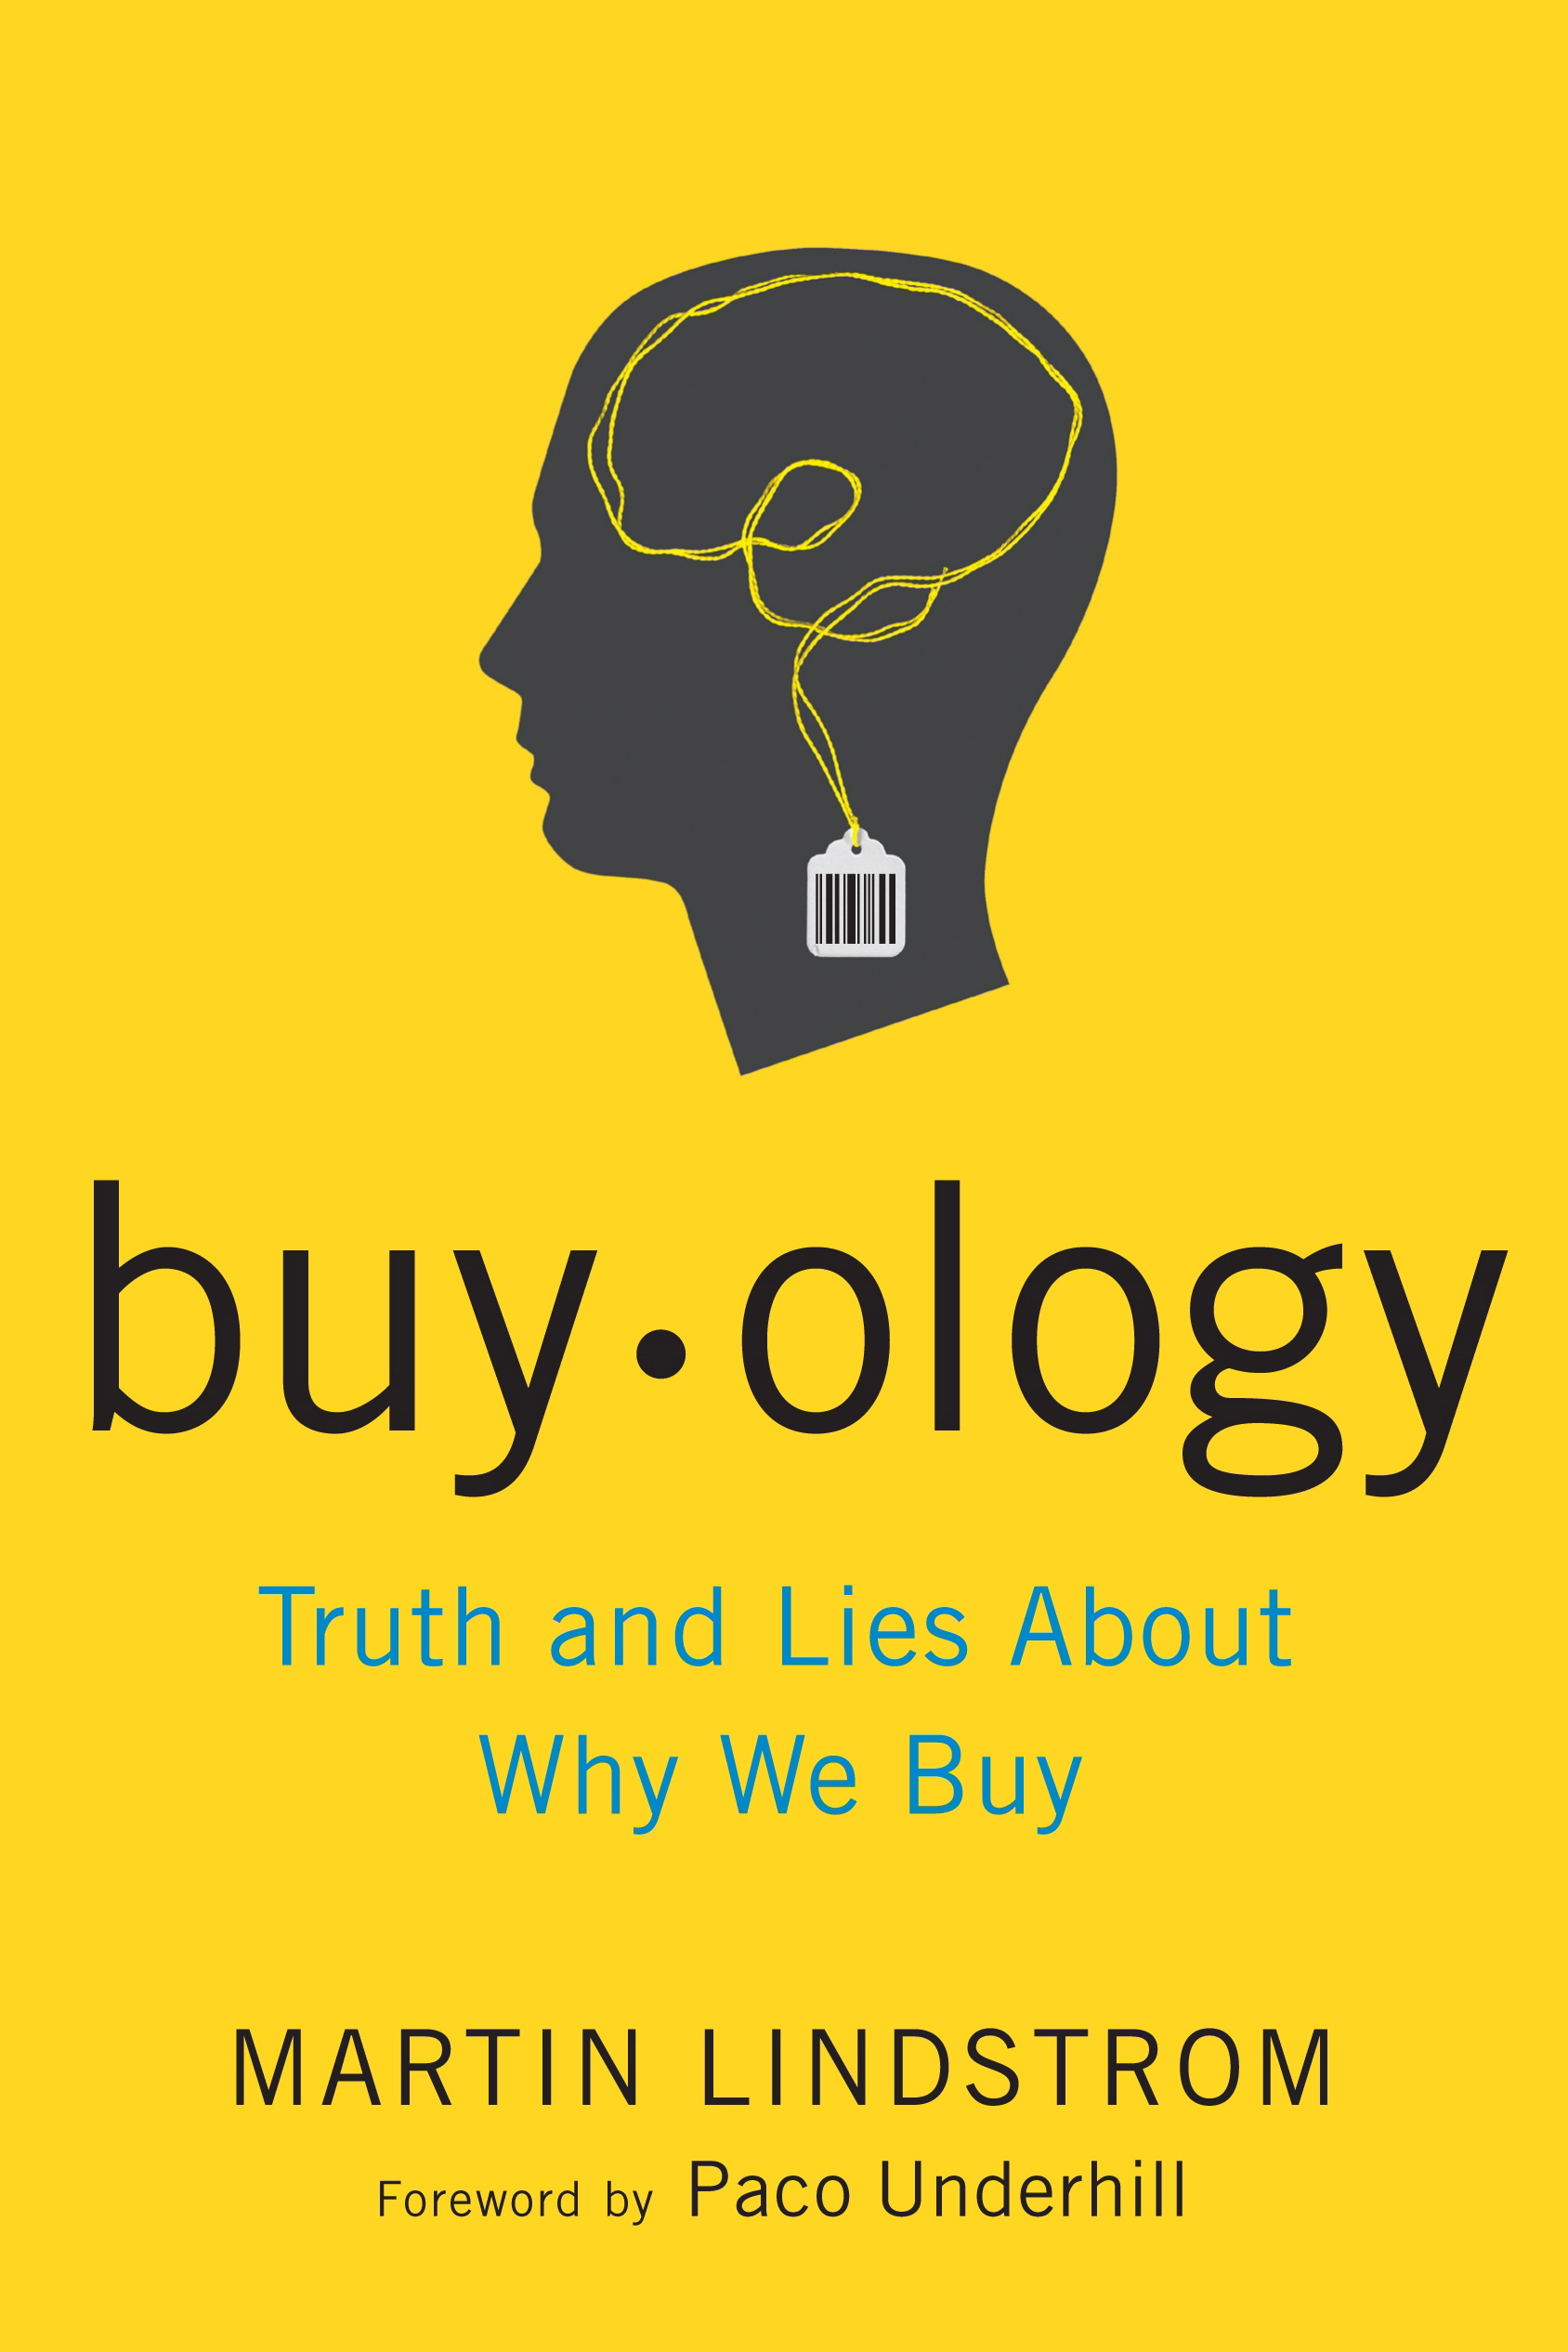 Buyology by Martin Lindstrom - Neuromarketing